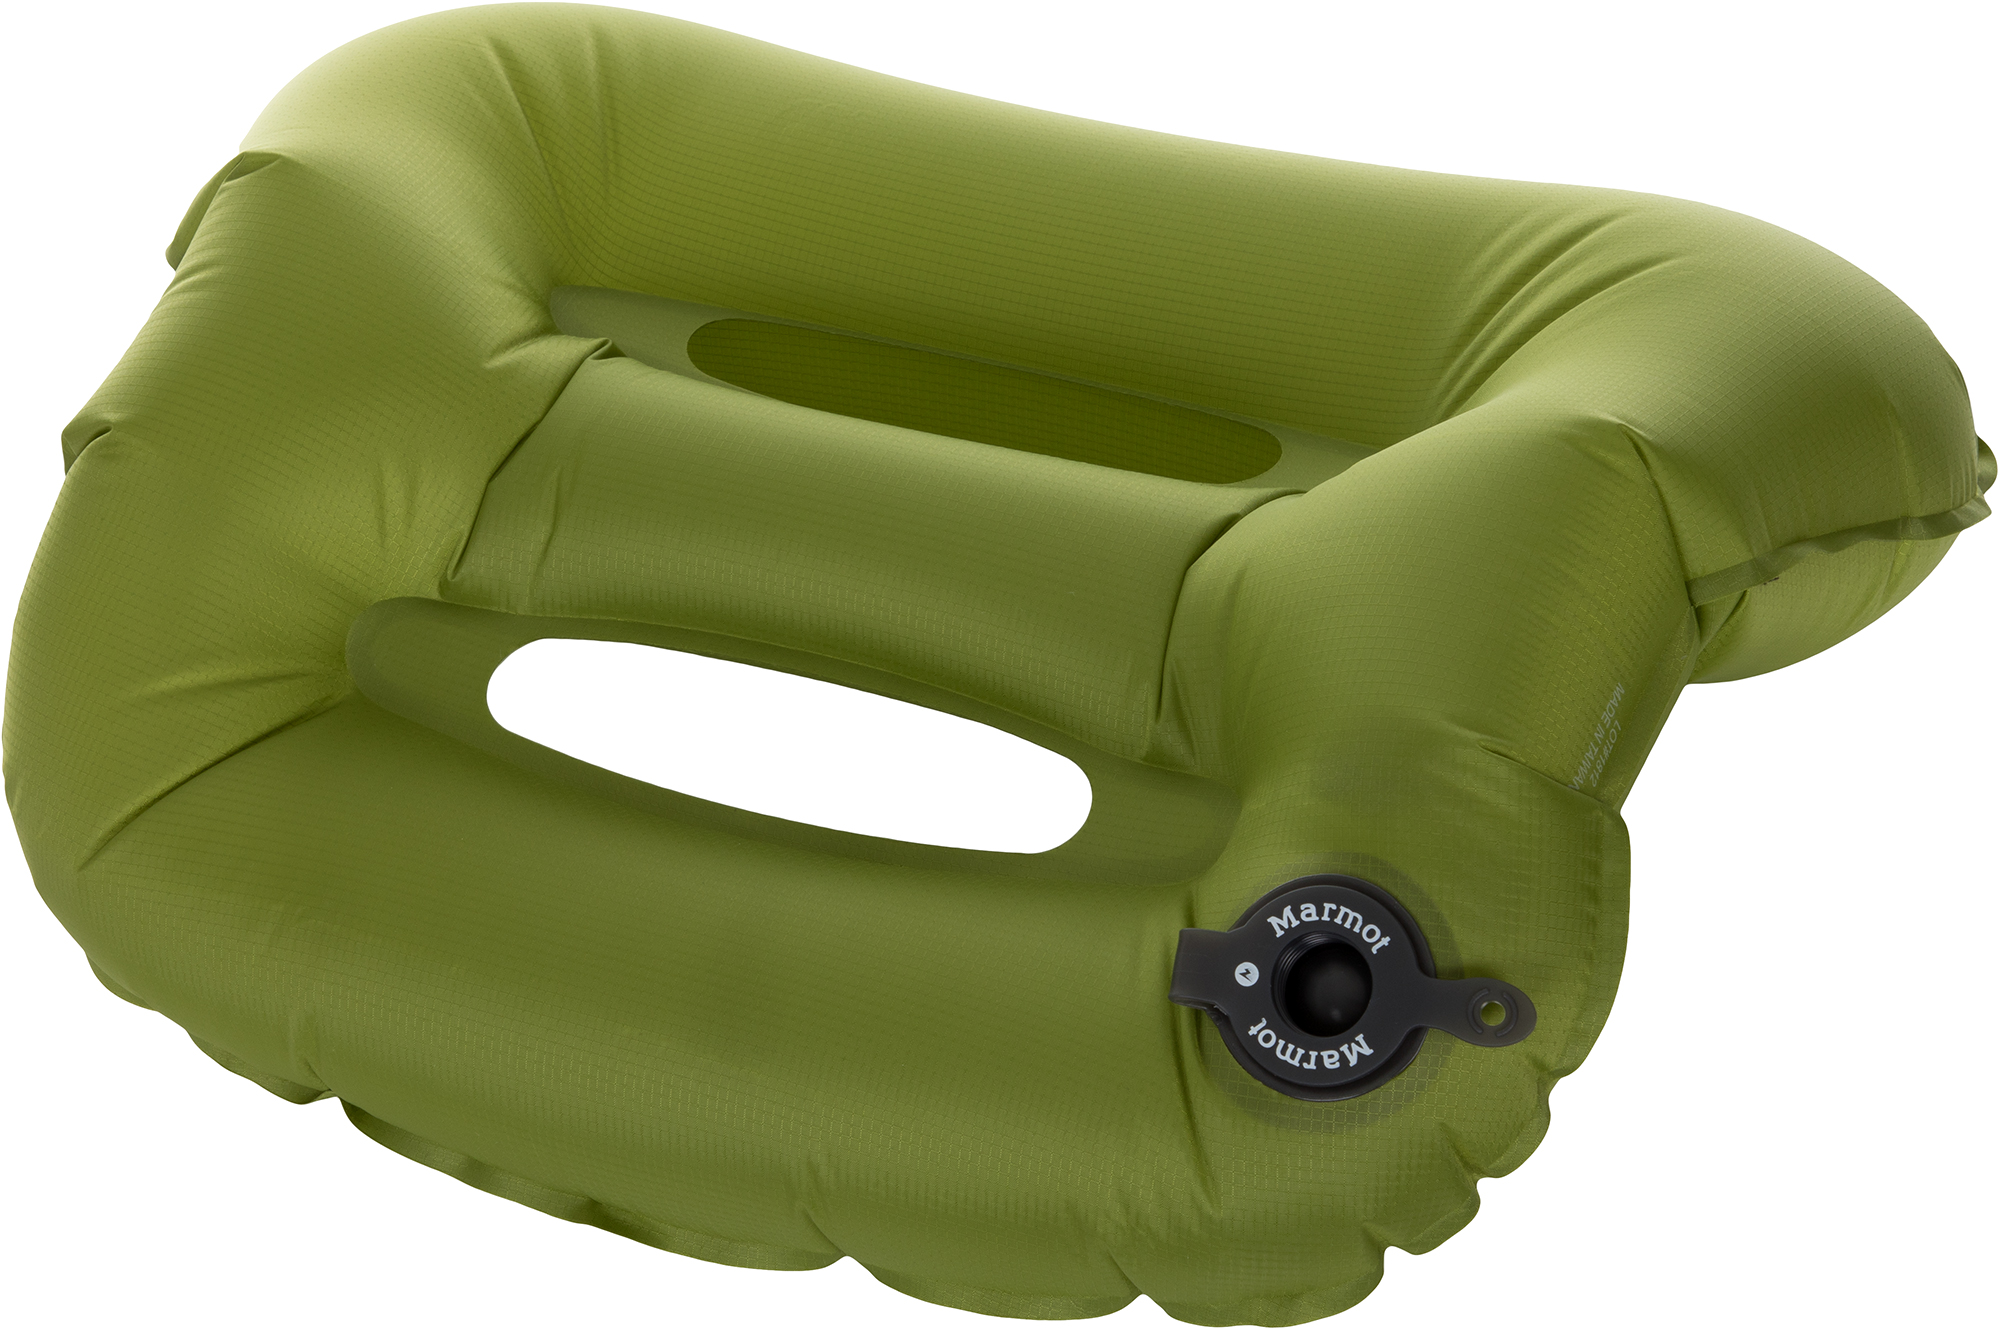 Marmot Marmot Strato Pillow